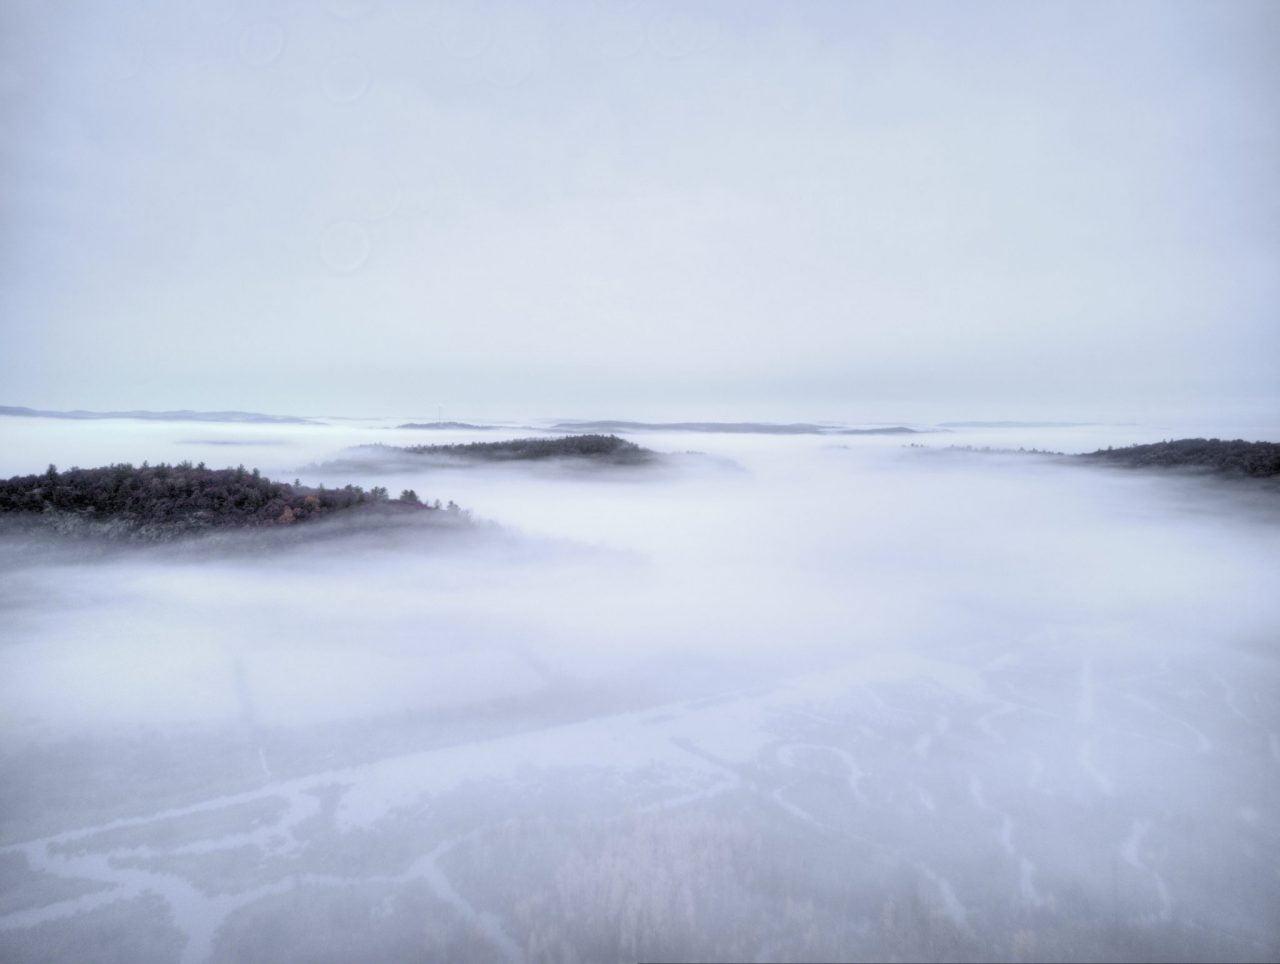 Photographie du brouillard a Eco-Odyssée dans Wakefield